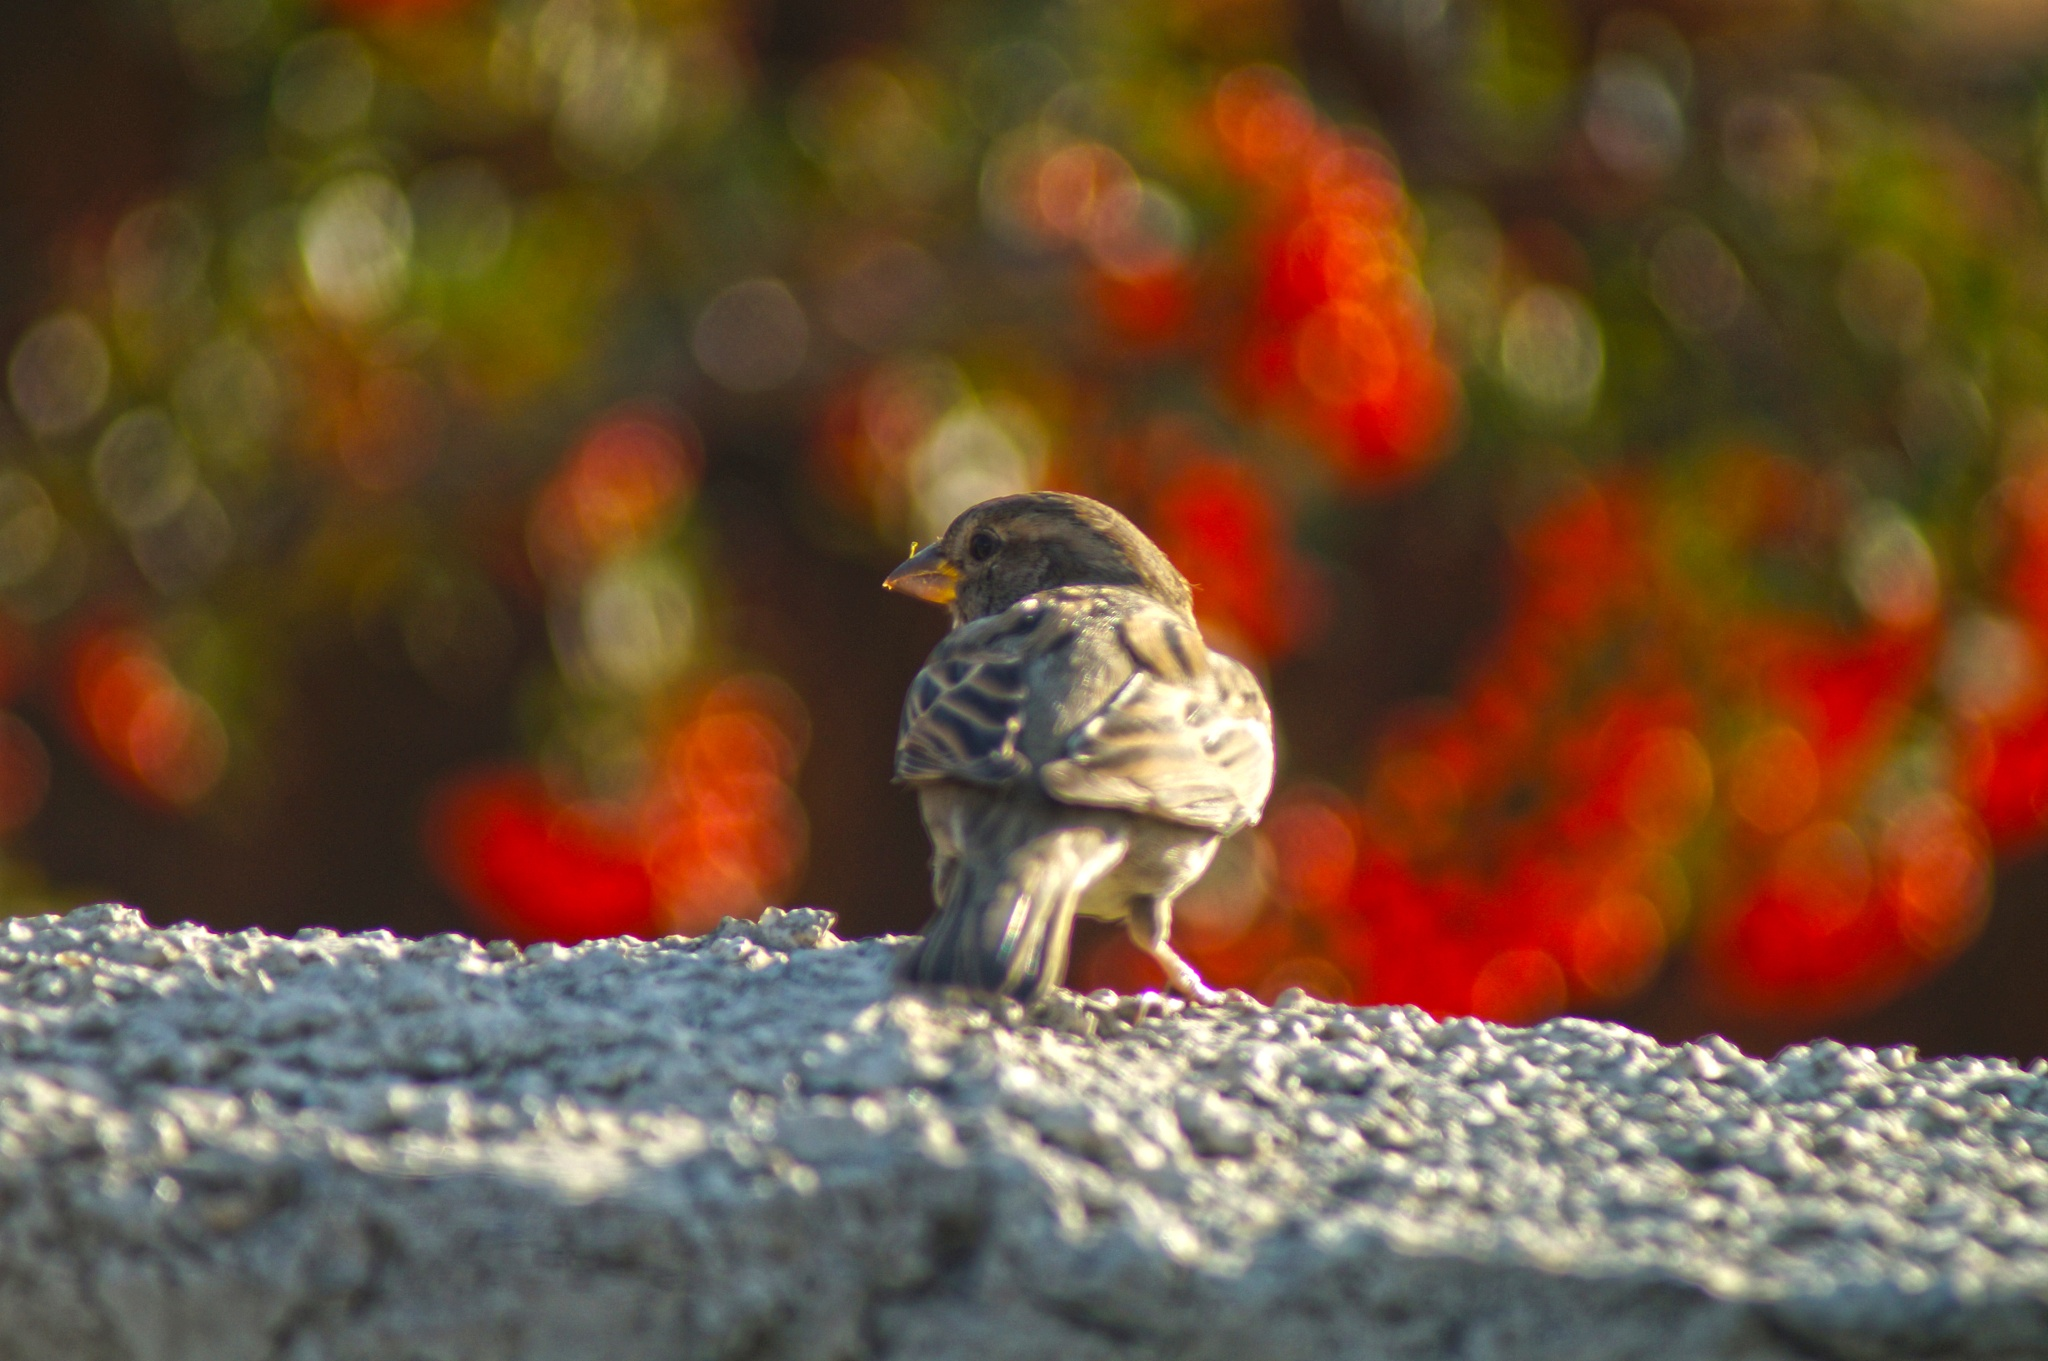 Sparrow by Blackhawk